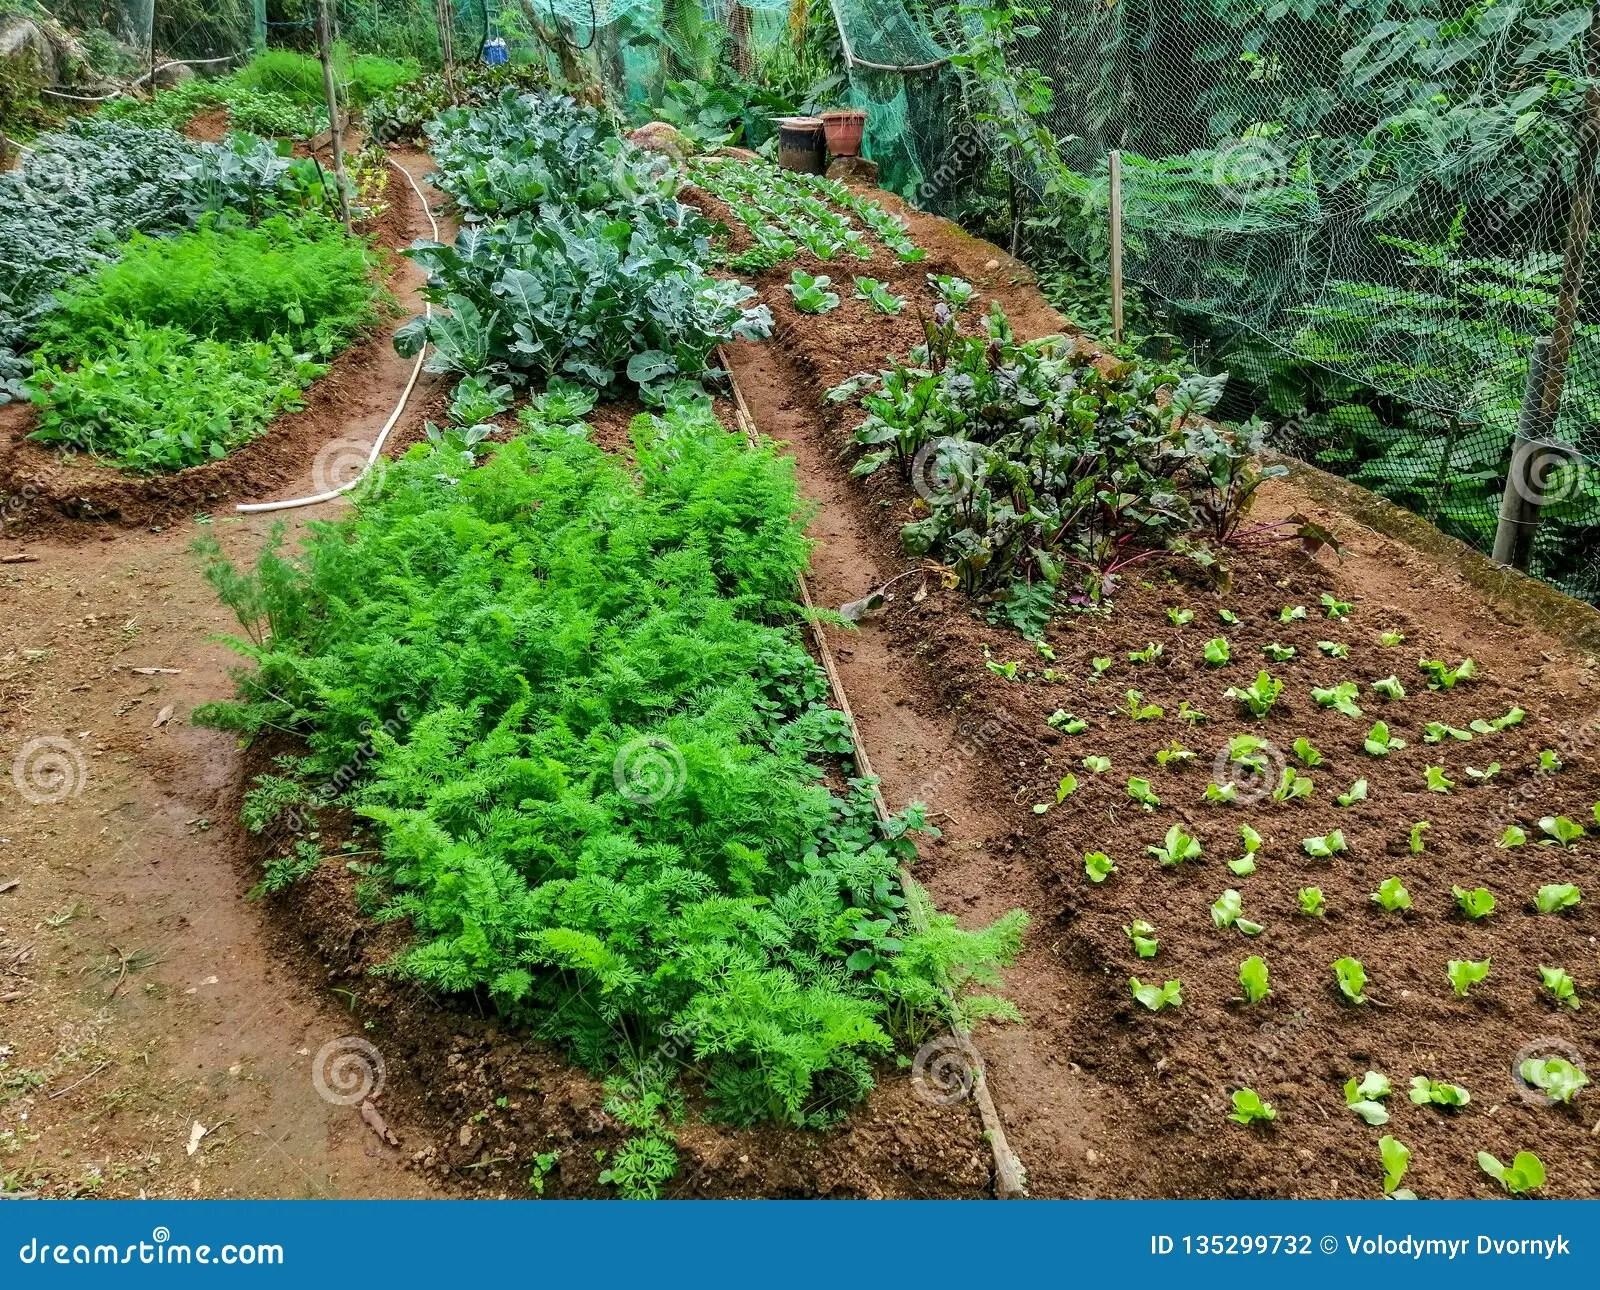 An Organic Farm On The Lantau Island. Hong Kong Stock Photo - Image of local. brown: 135299732